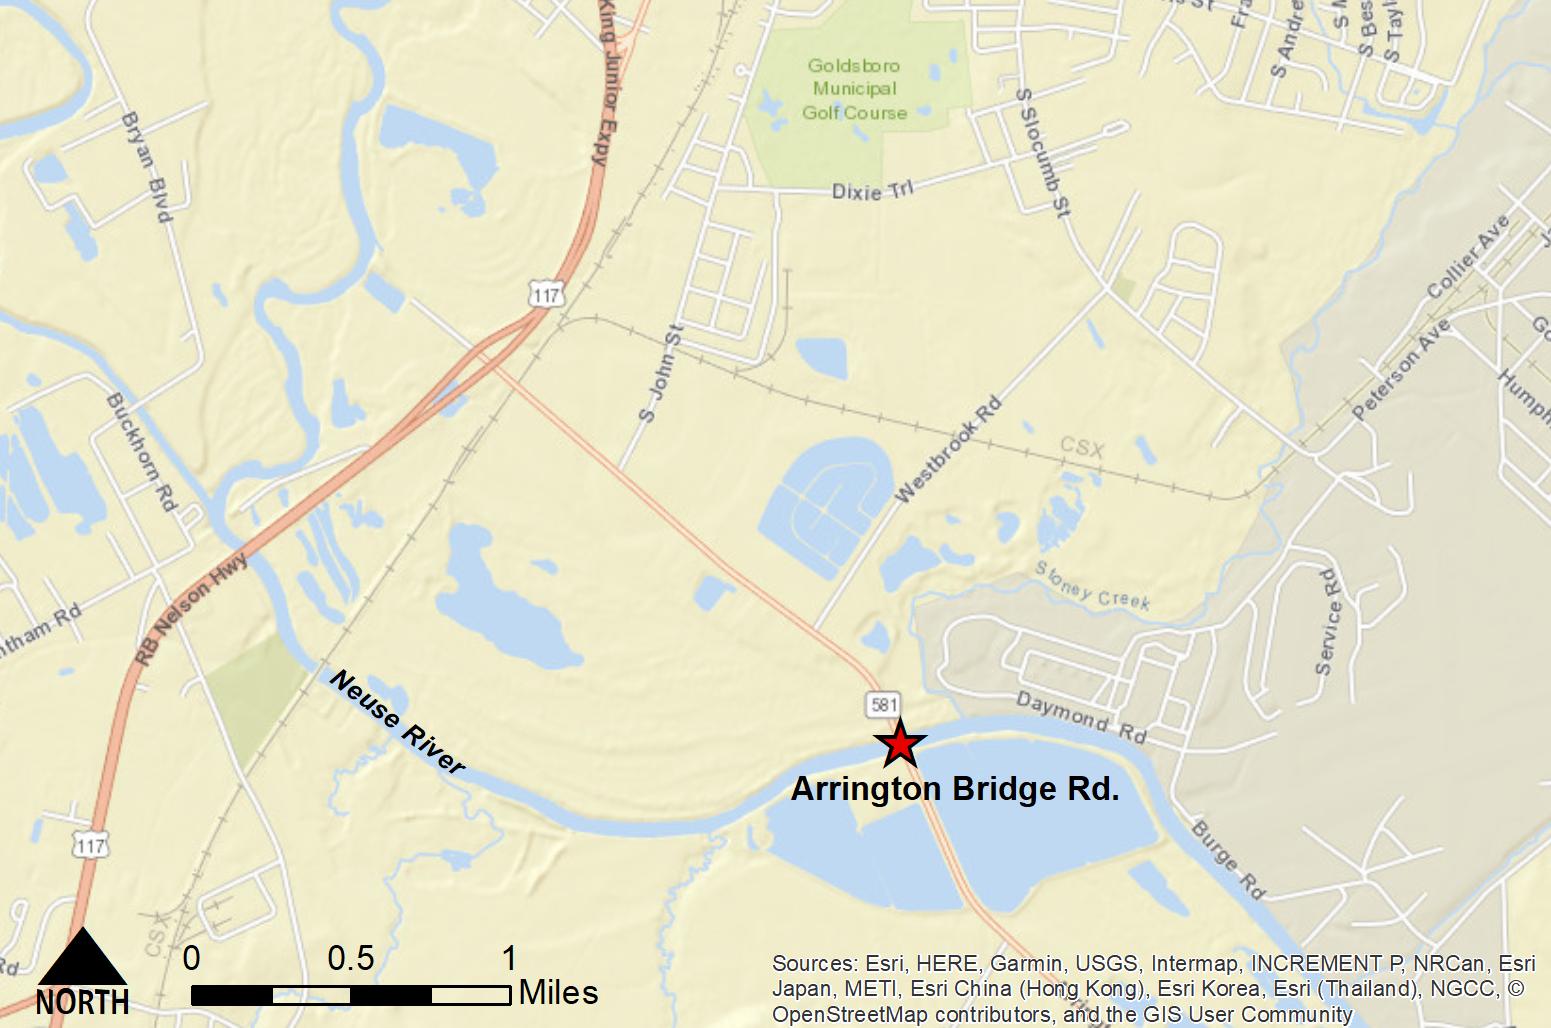 Street map of Goldsboro bridge investigated in the modeling study.